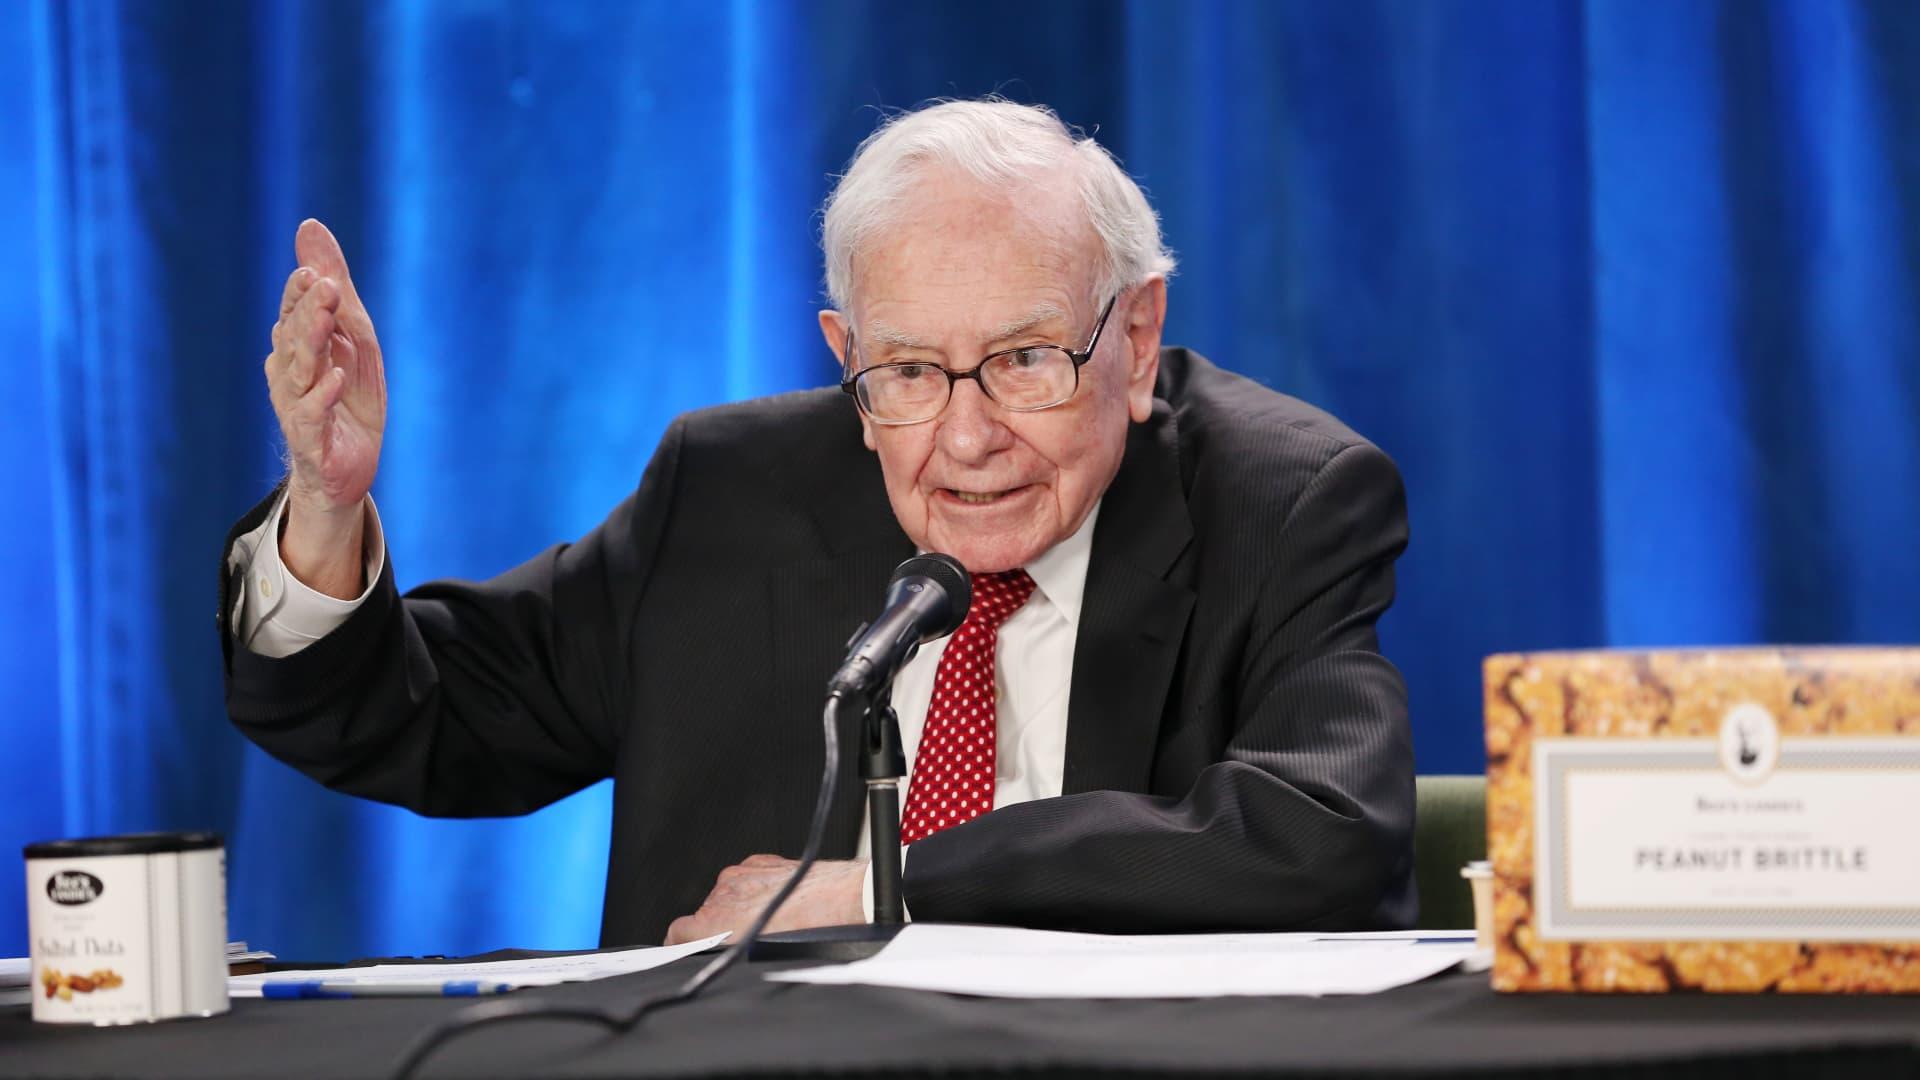 Warren Buffett at Berkshire Hathaway's annual meeting in Los Angeles, California. May 1, 2021.